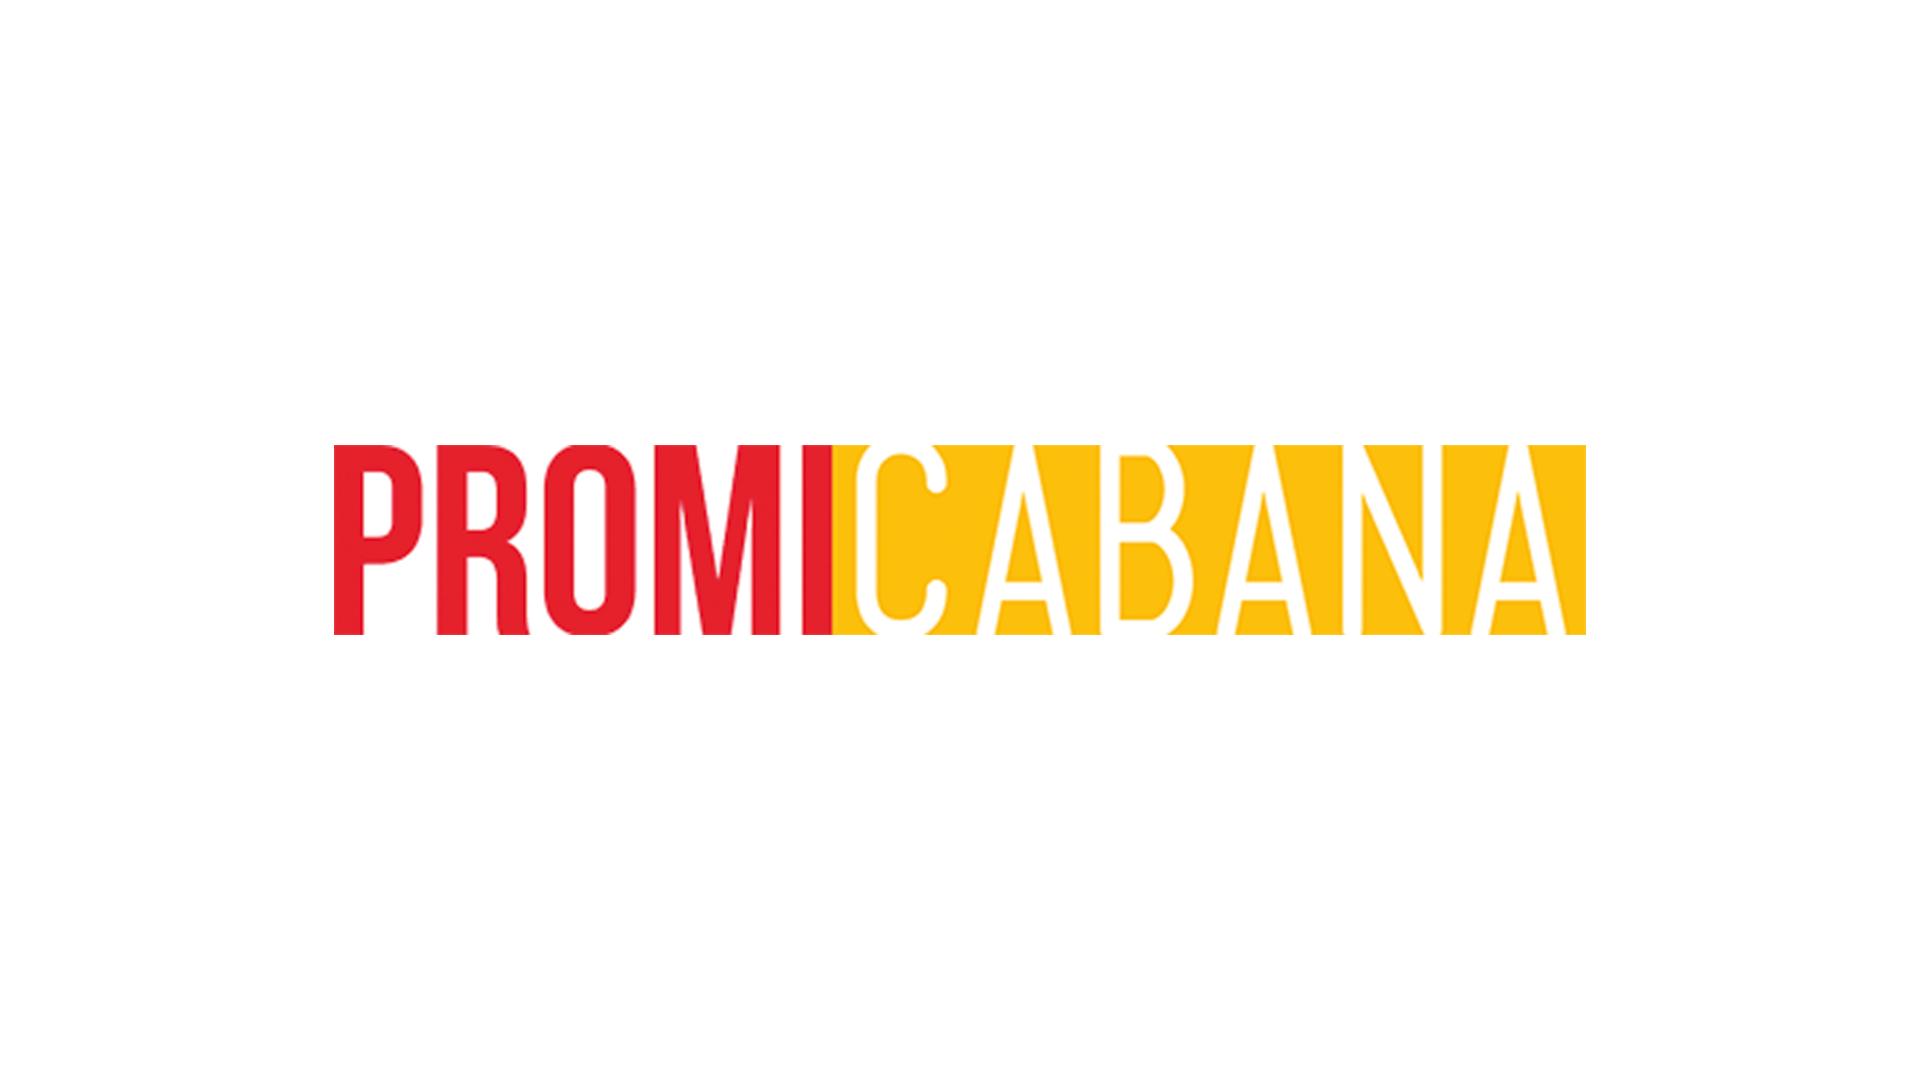 George-Clooney-Cindy-Crawford-Tequila-Werbung